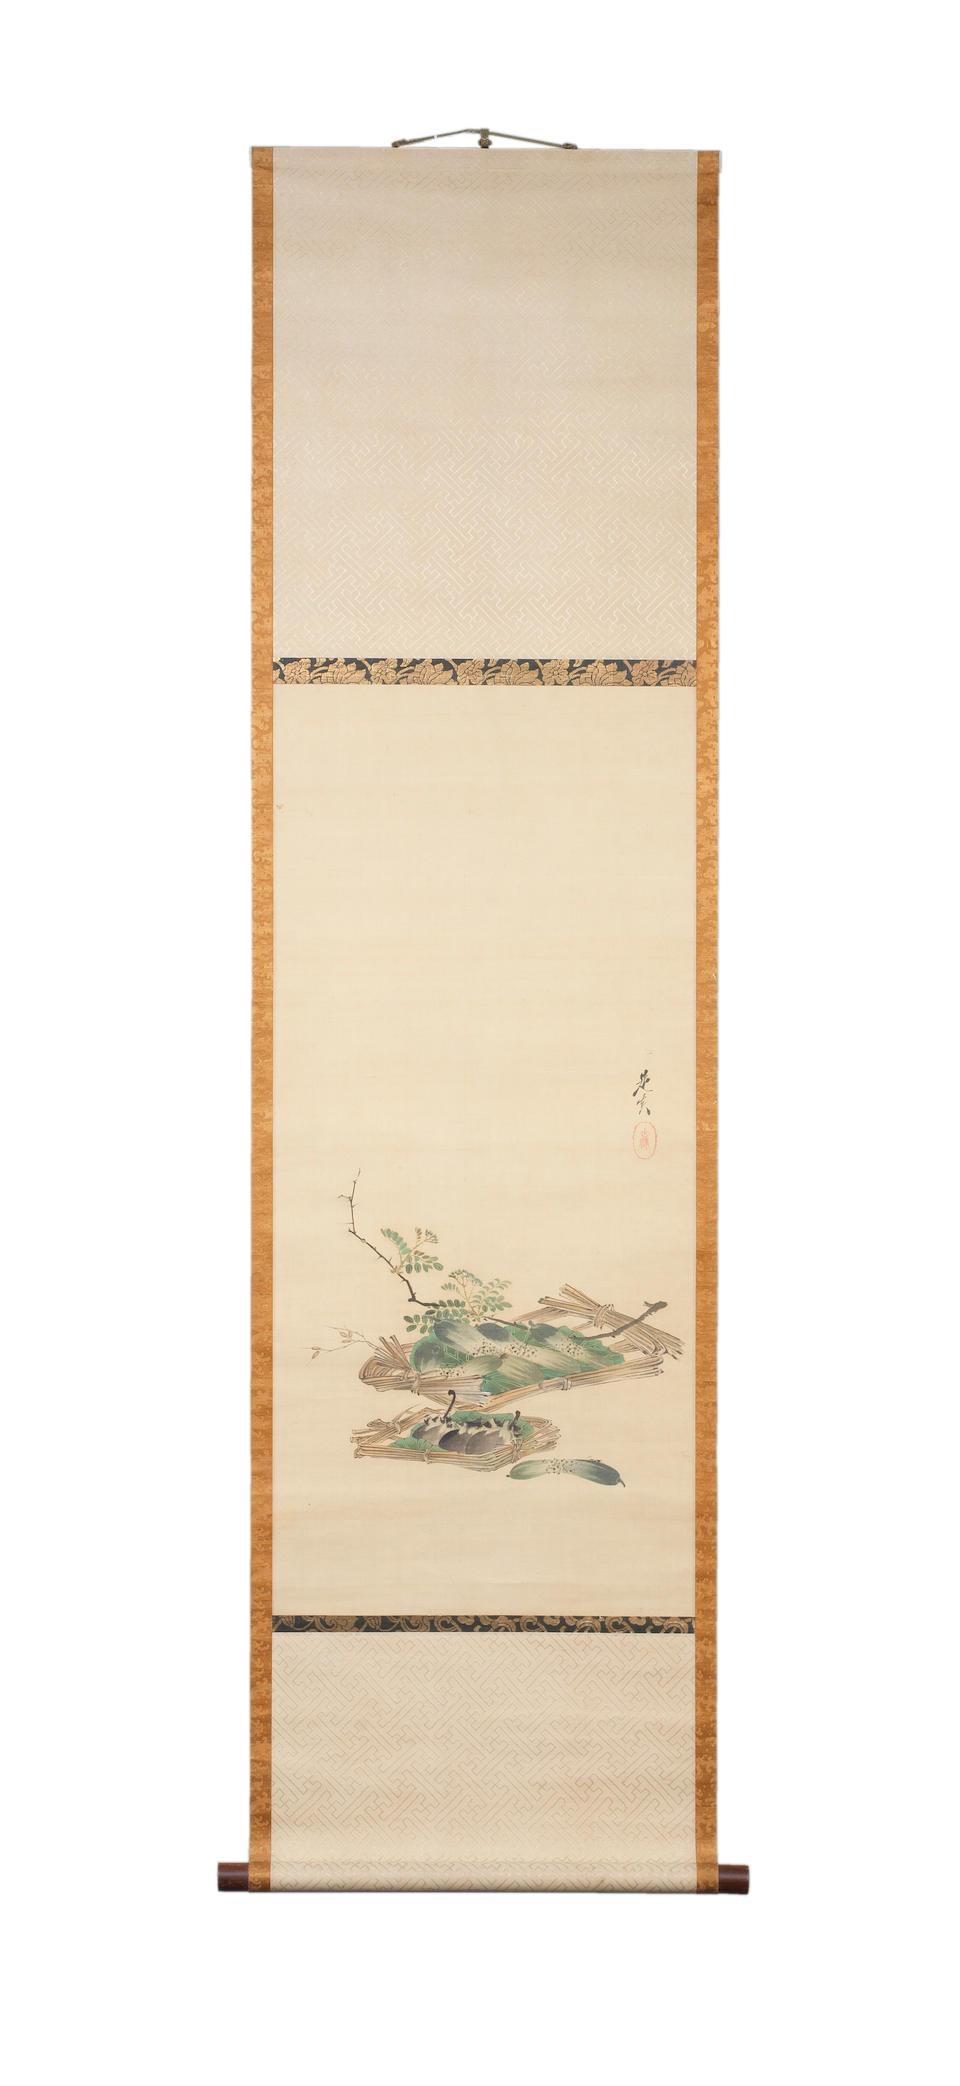 SHIBATA ZESHIN 柴田是真 (1807–1891) CUCUMBERS AND AUBERGINES 胡瓜茄子図絹本着色掛軸 Meiji era (1868–1912), circa 1880–1890